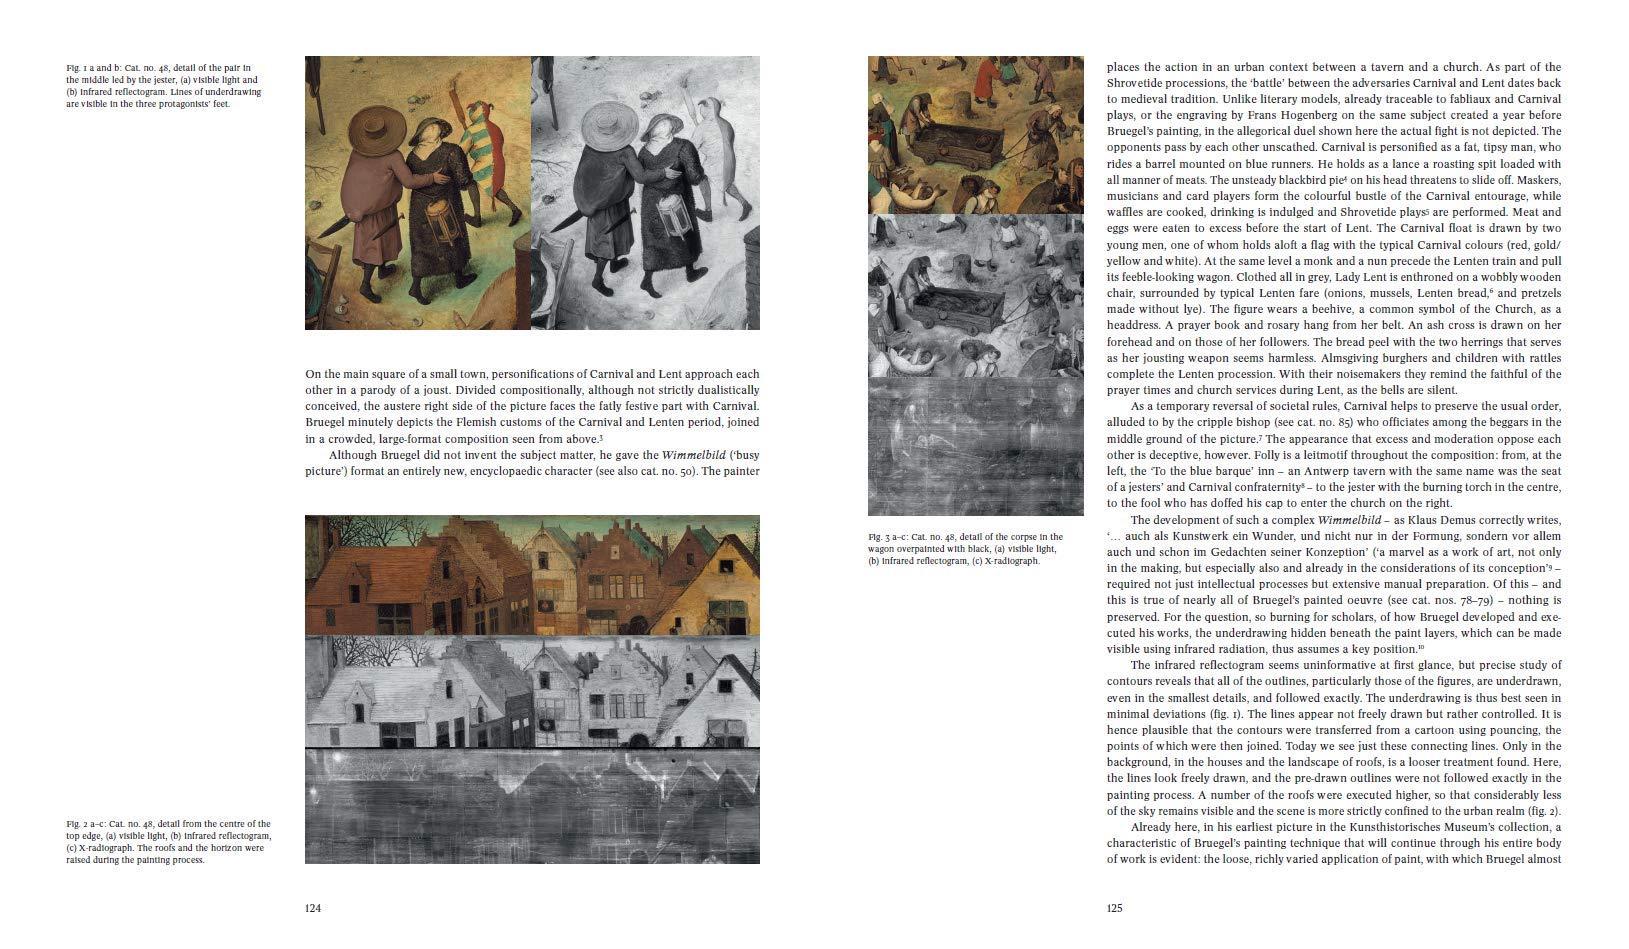 Bruegel: The Master thumbnail